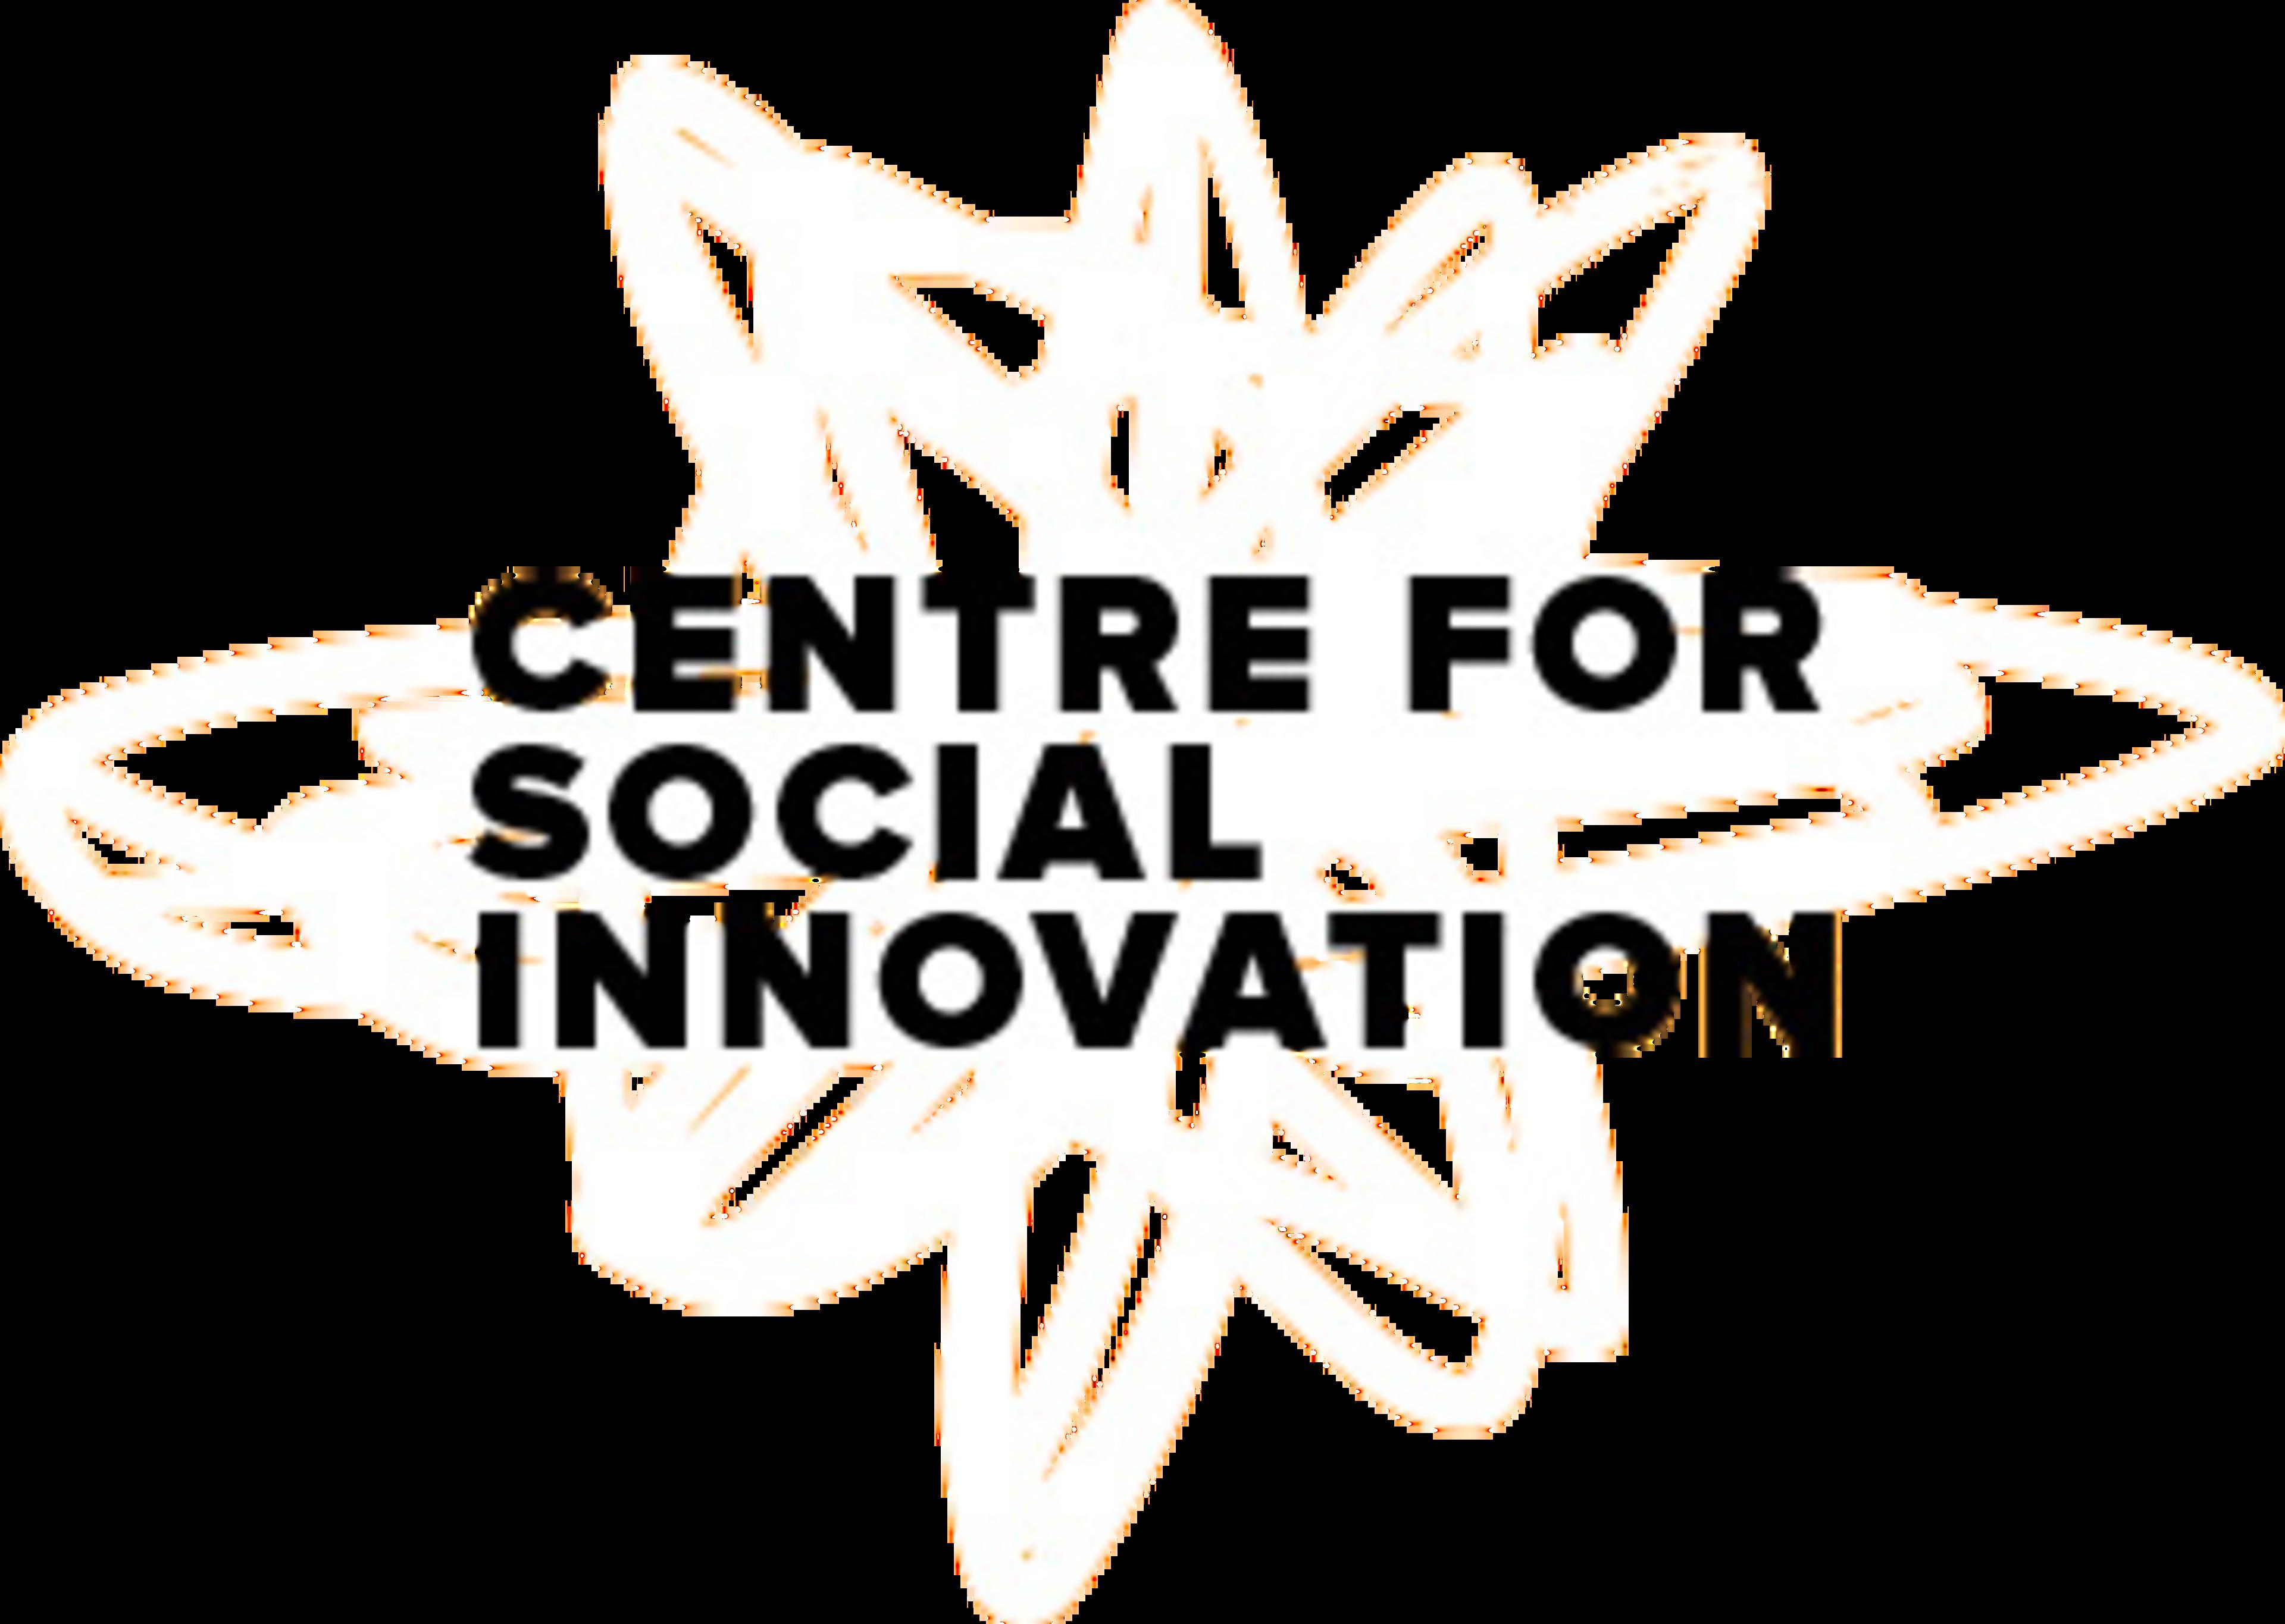 CSI logo example three (Starburst asterisk shape)